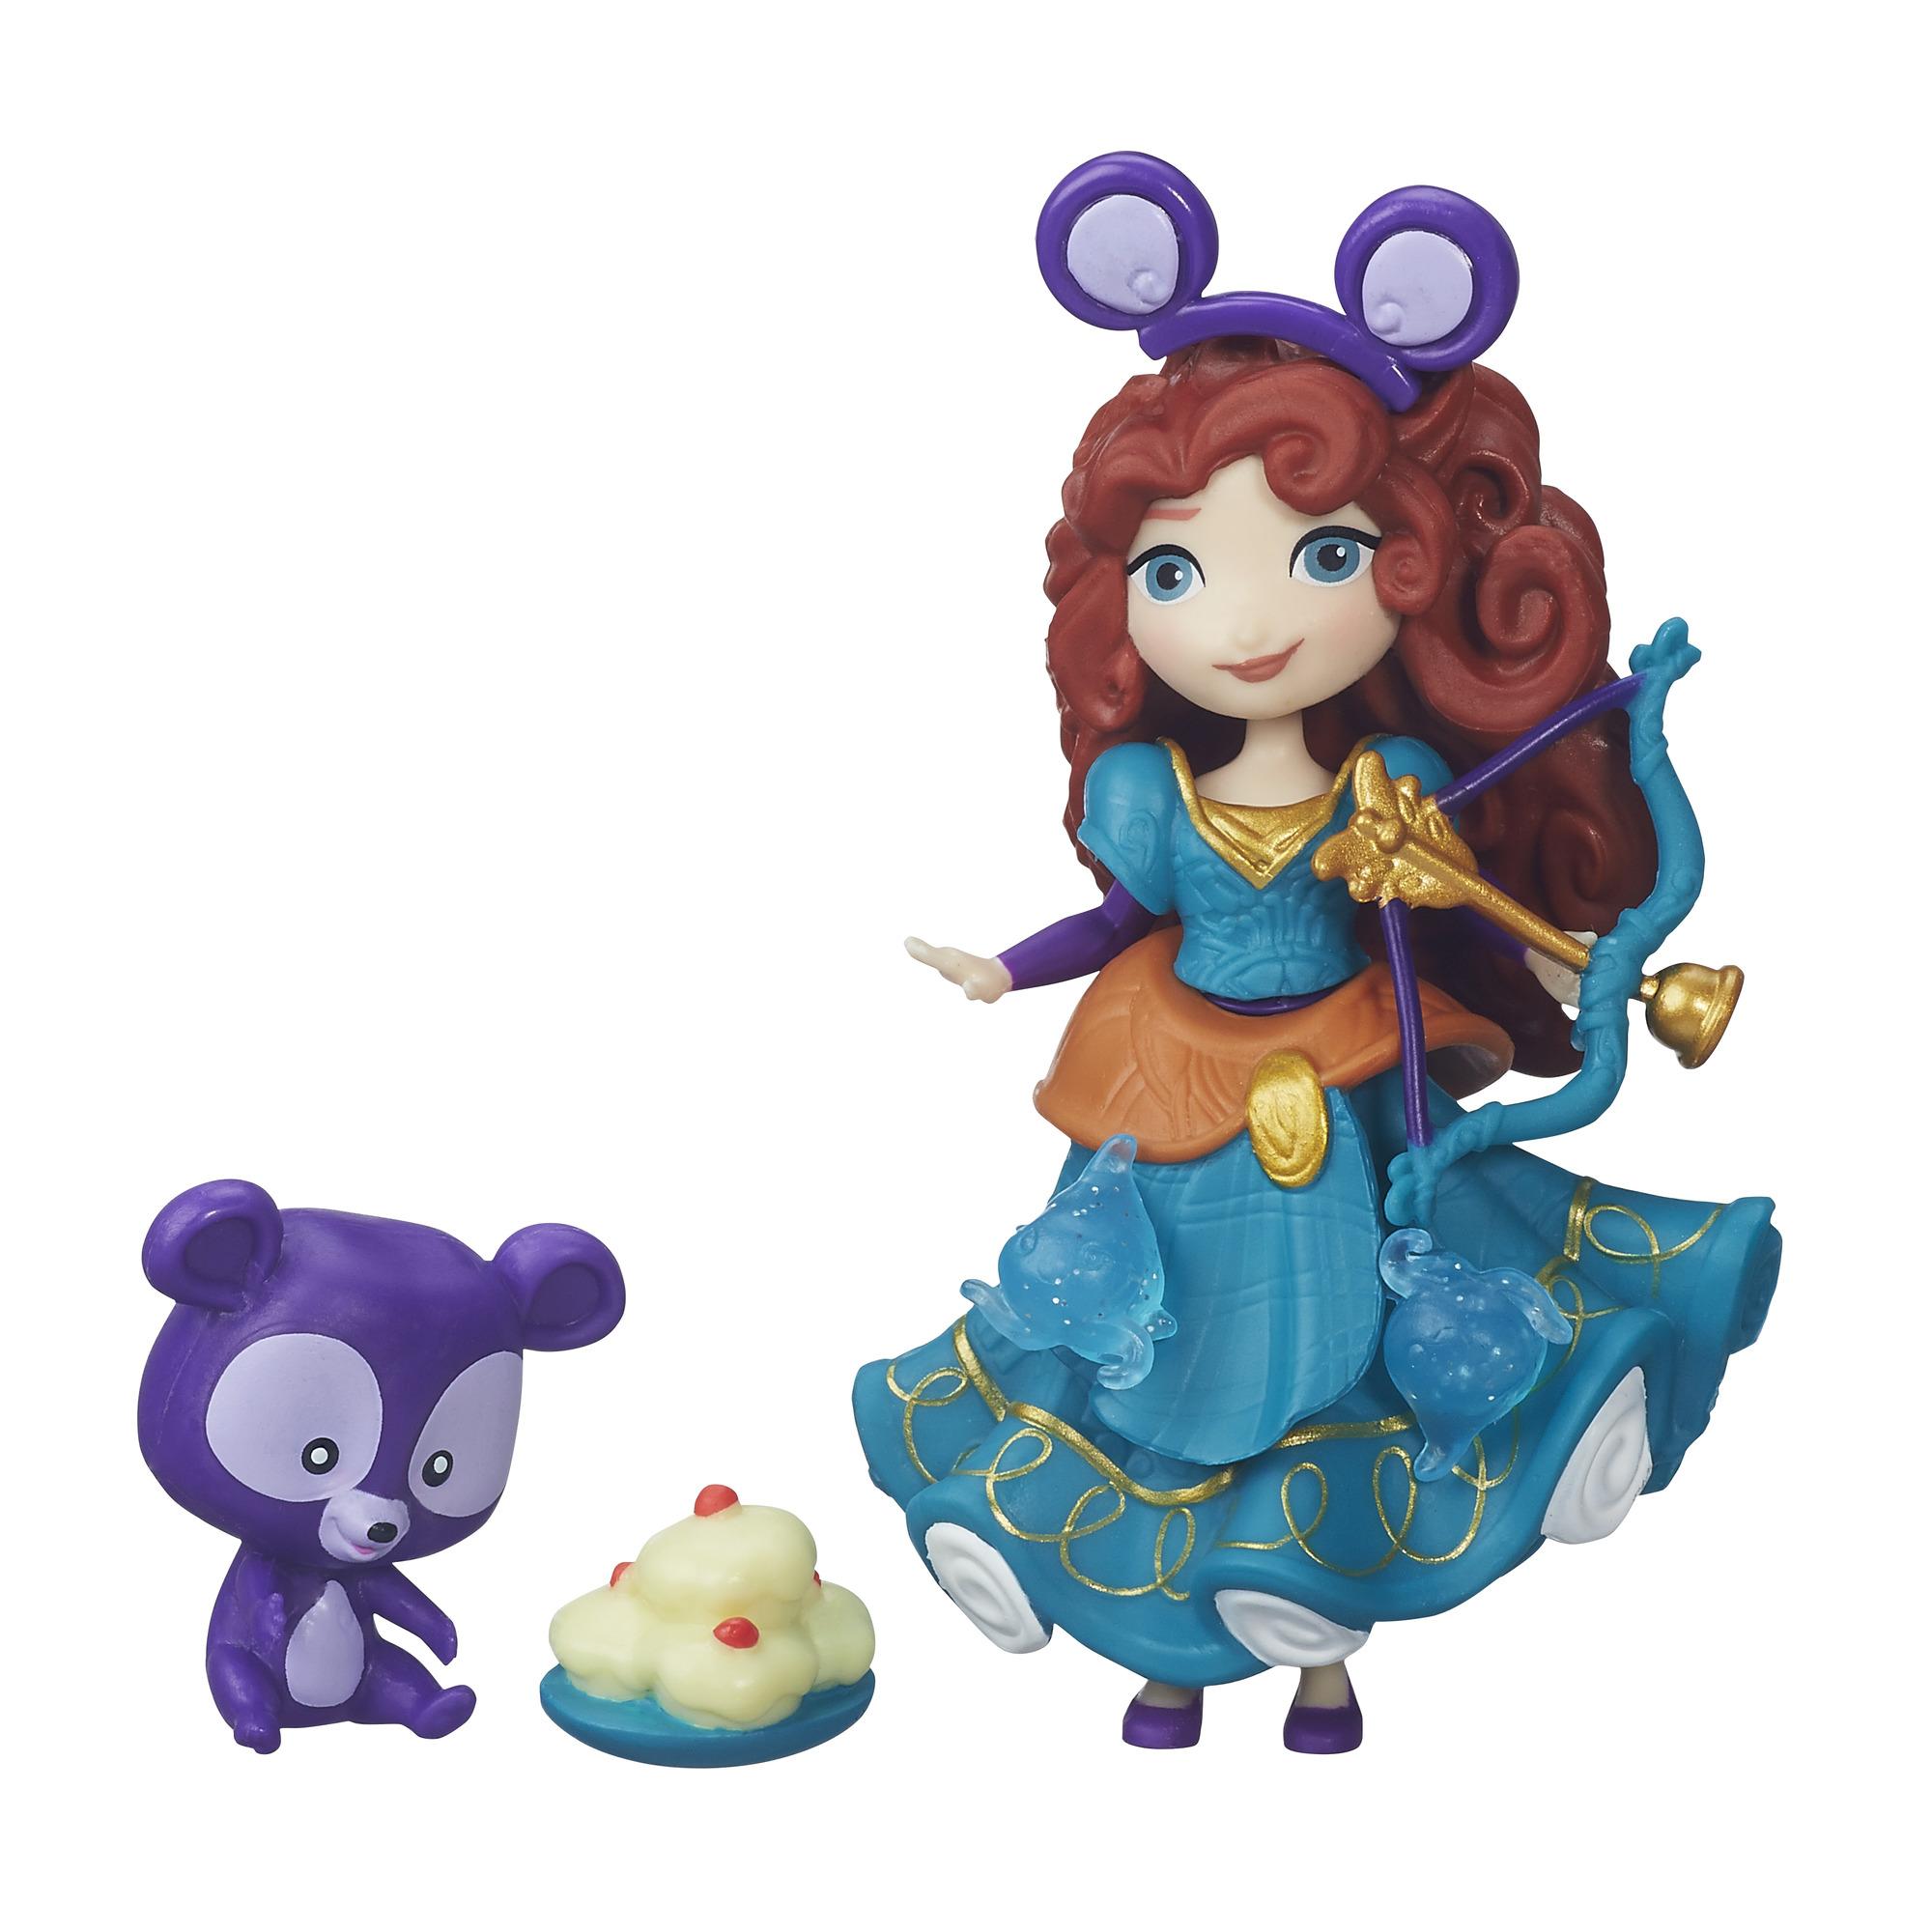 Disney Princess Little Kingdom Merida and Bear Brother